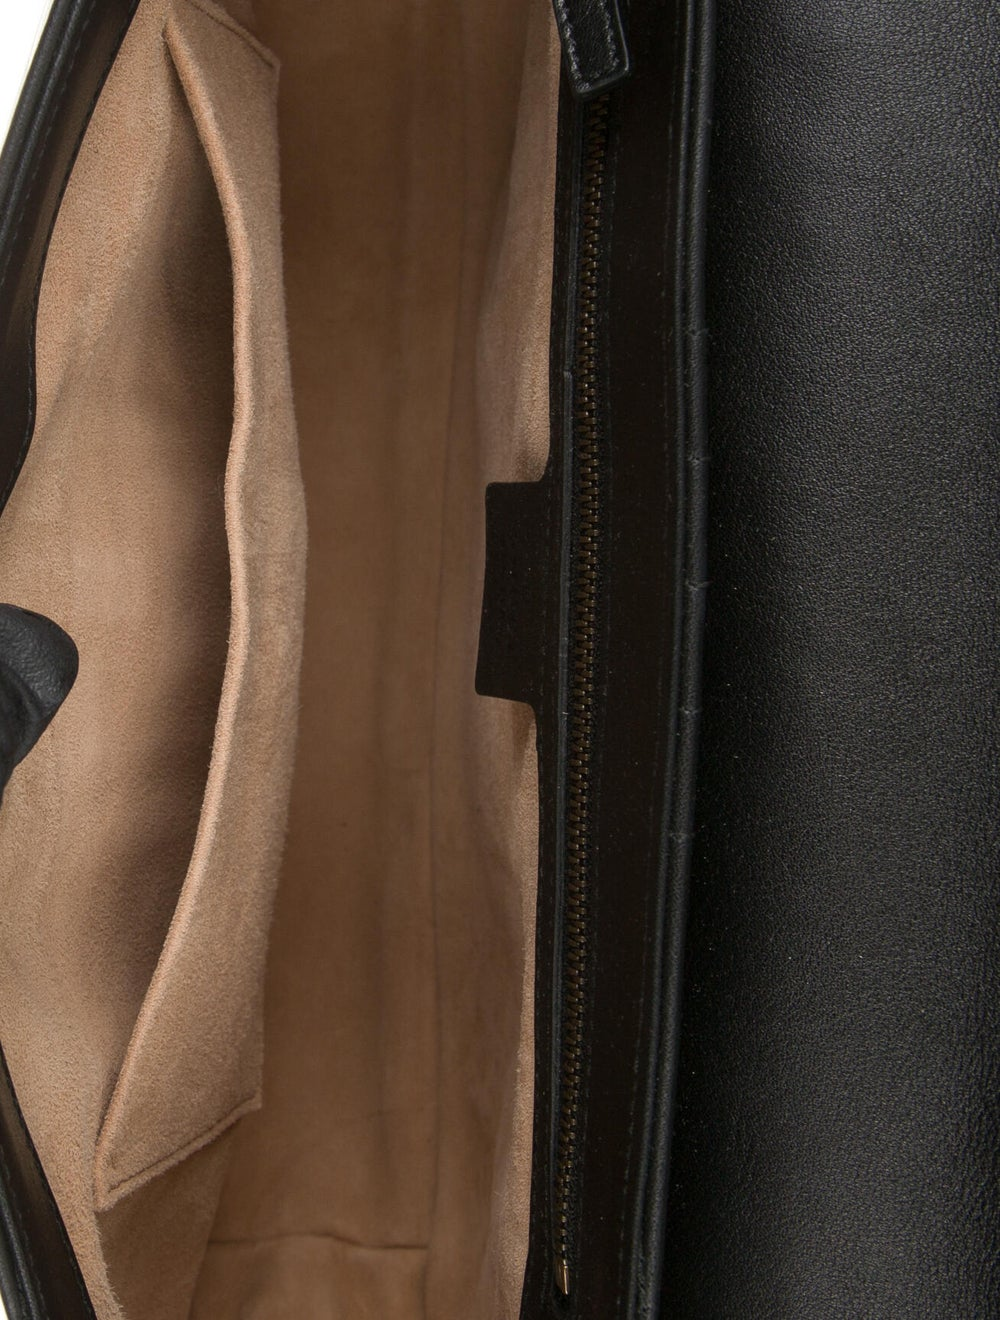 Gucci Bamboo Leopard Top Handle Bag Black - image 6